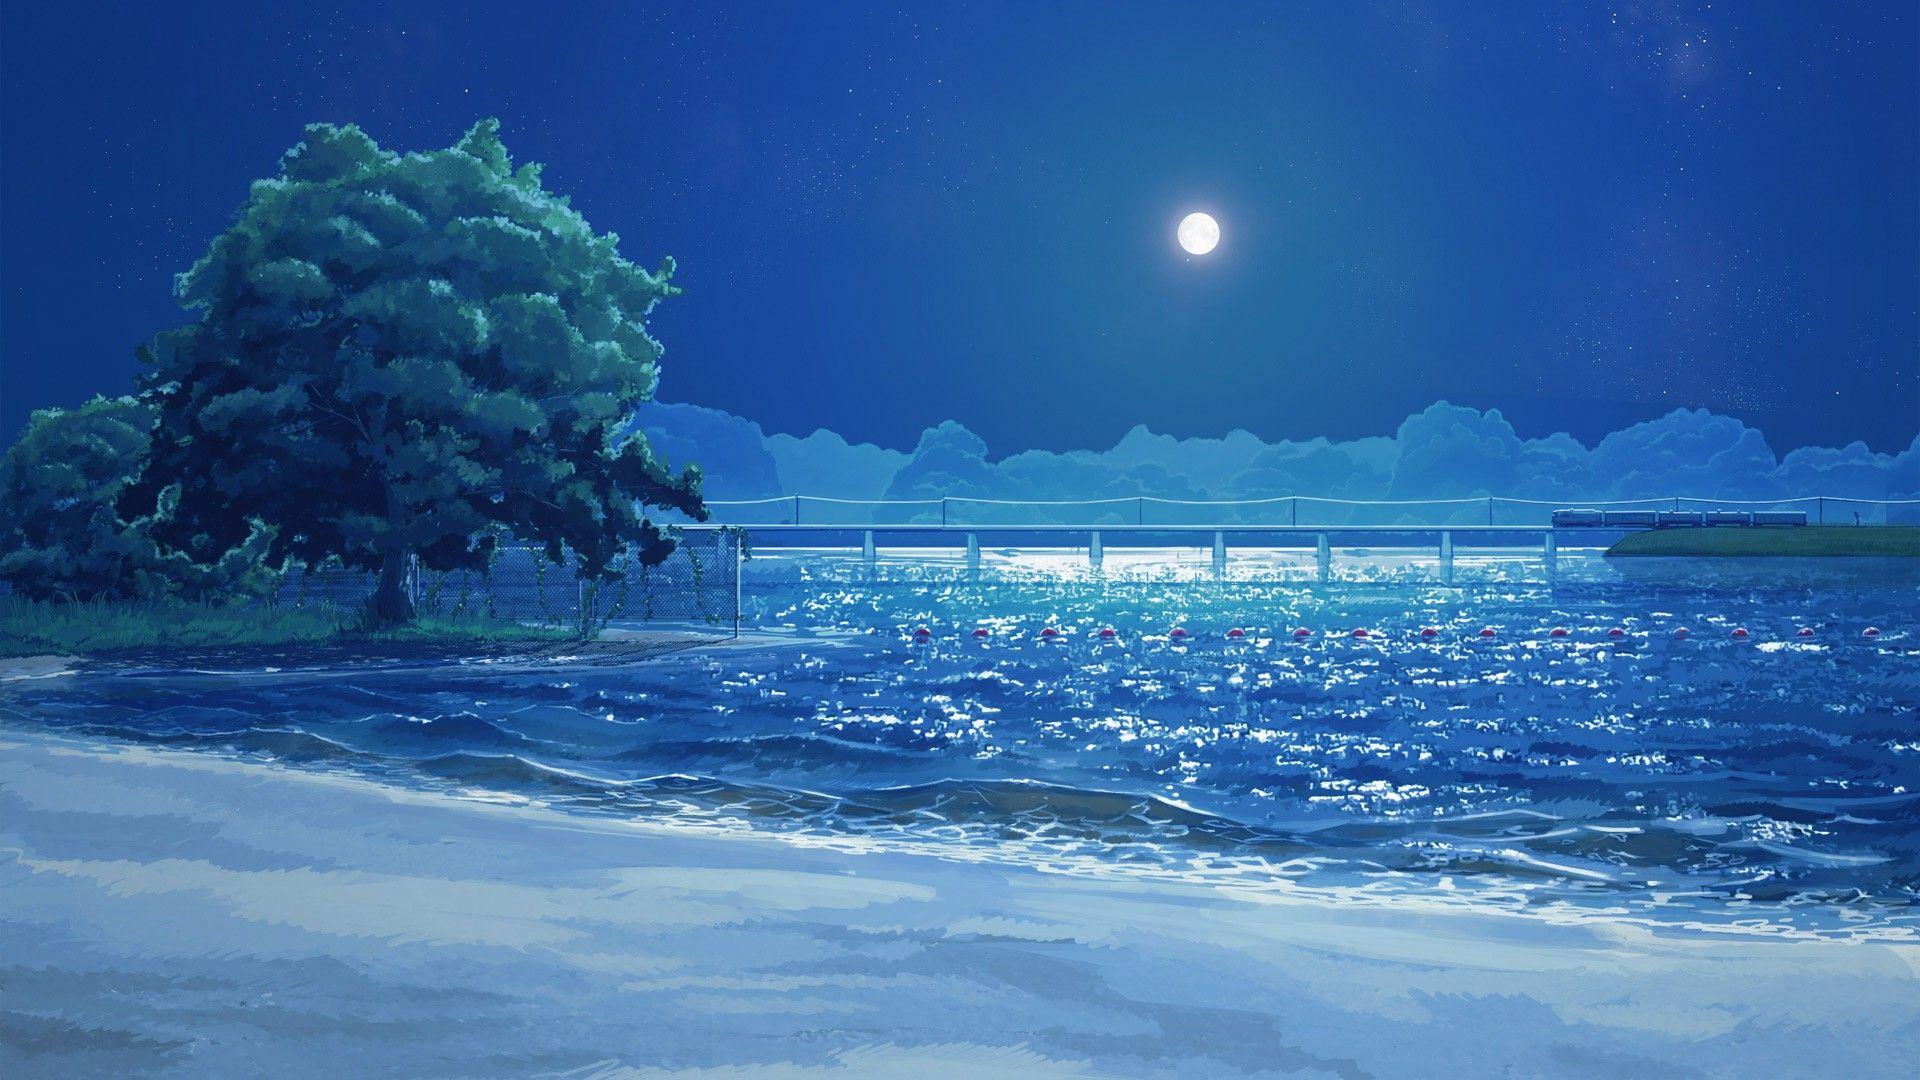 Beach Arsenixc Trees Everlasting Summer Sea Clouds Visual Novel Moon Wallpaper Anime Scenery Anime Scenery Wallpaper Scenery Wallpaper